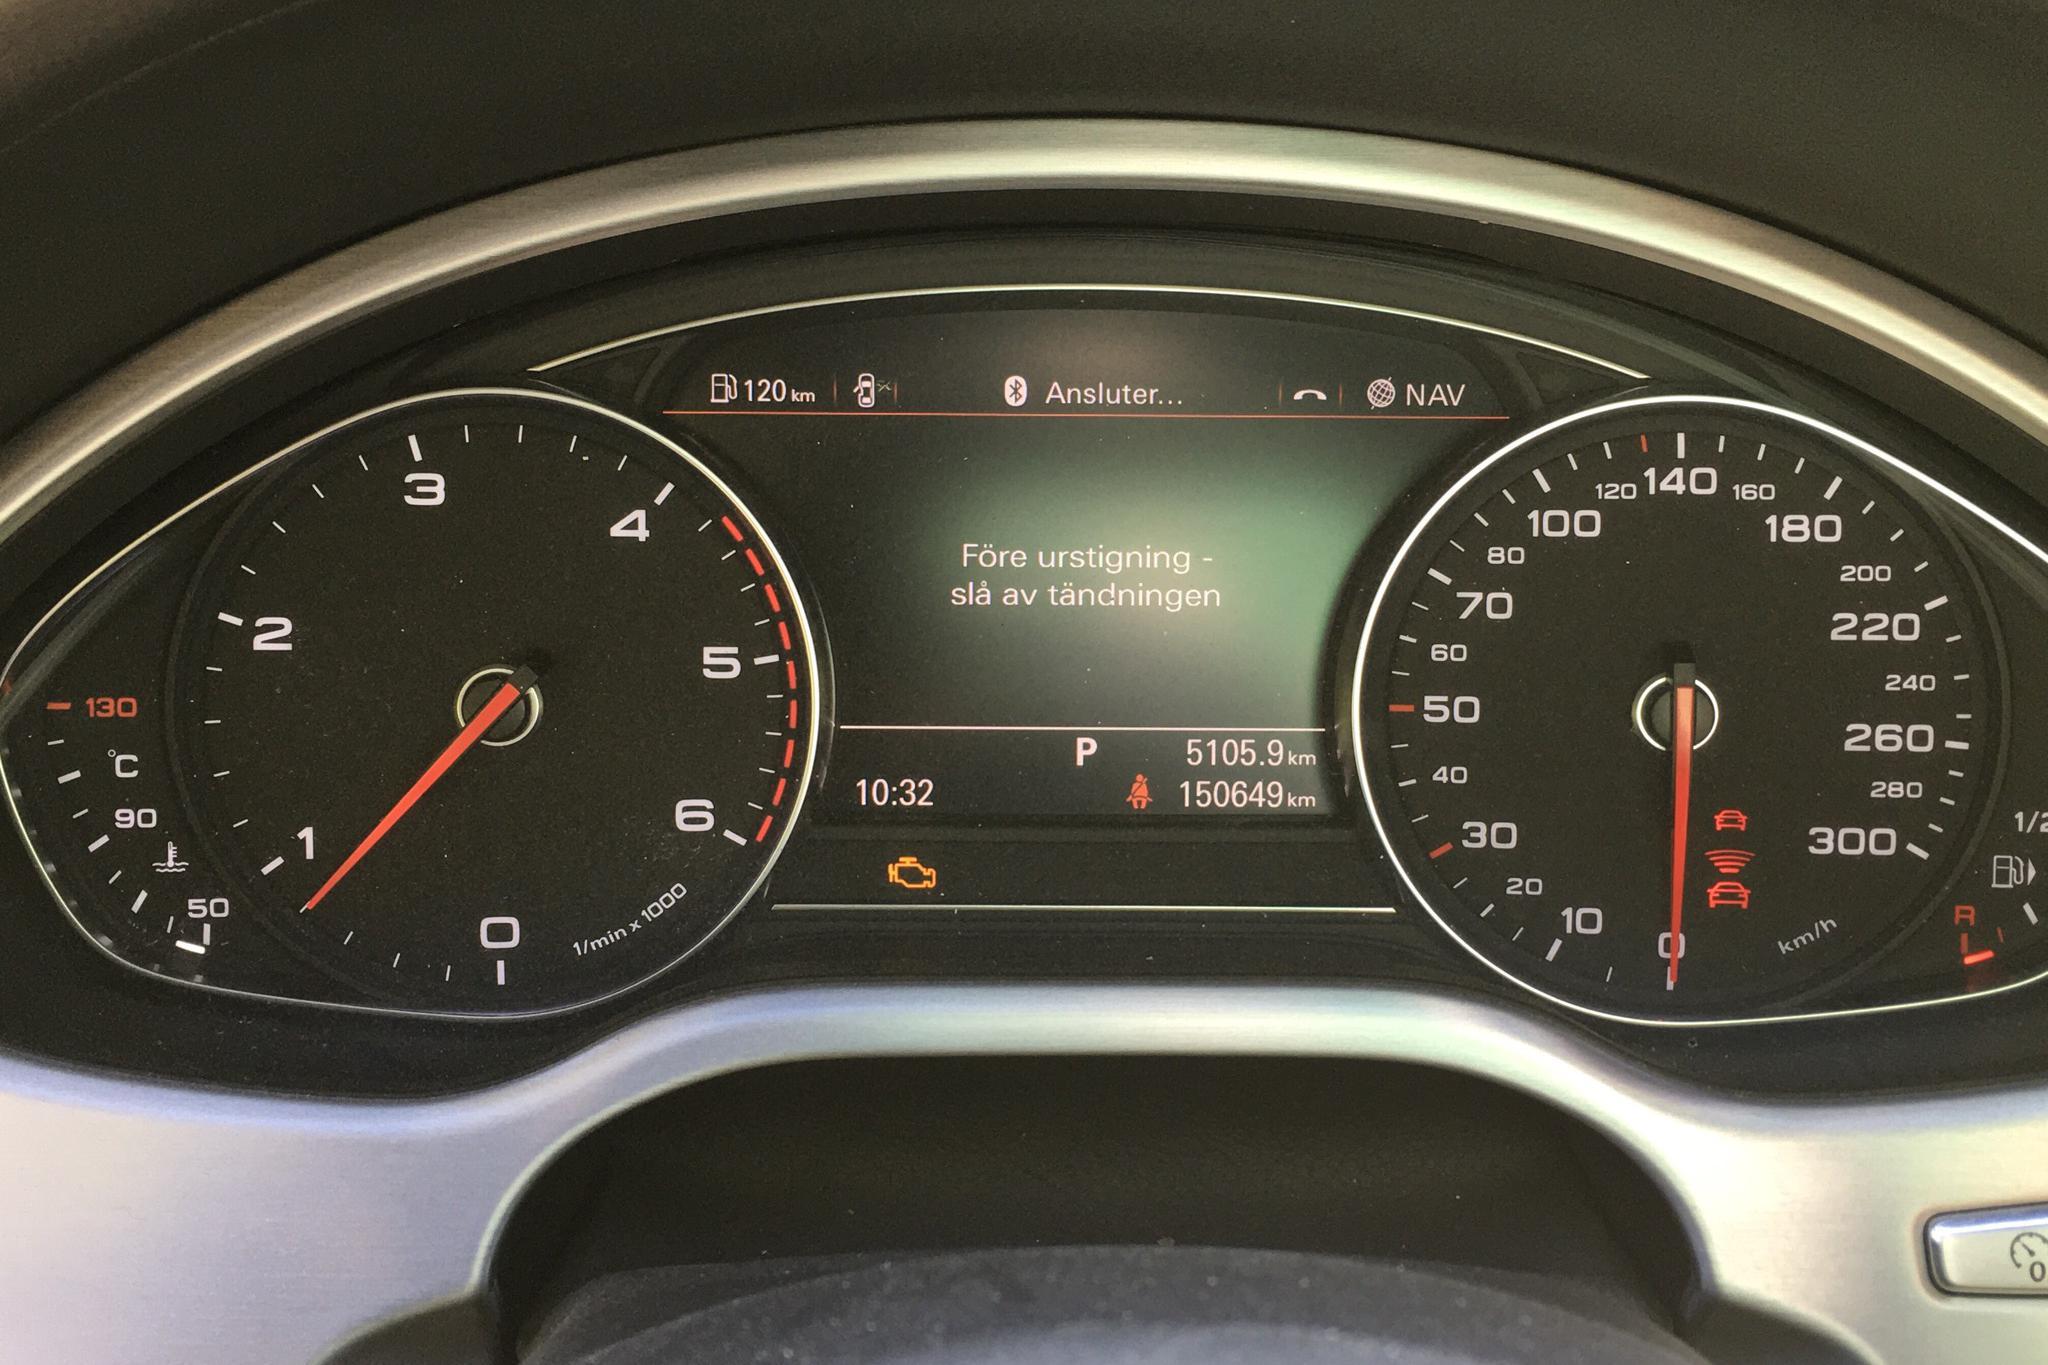 Audi A8 3.0 TDI quattro (262hk) - 150 640 km - Automatic - Dark Blue - 2016